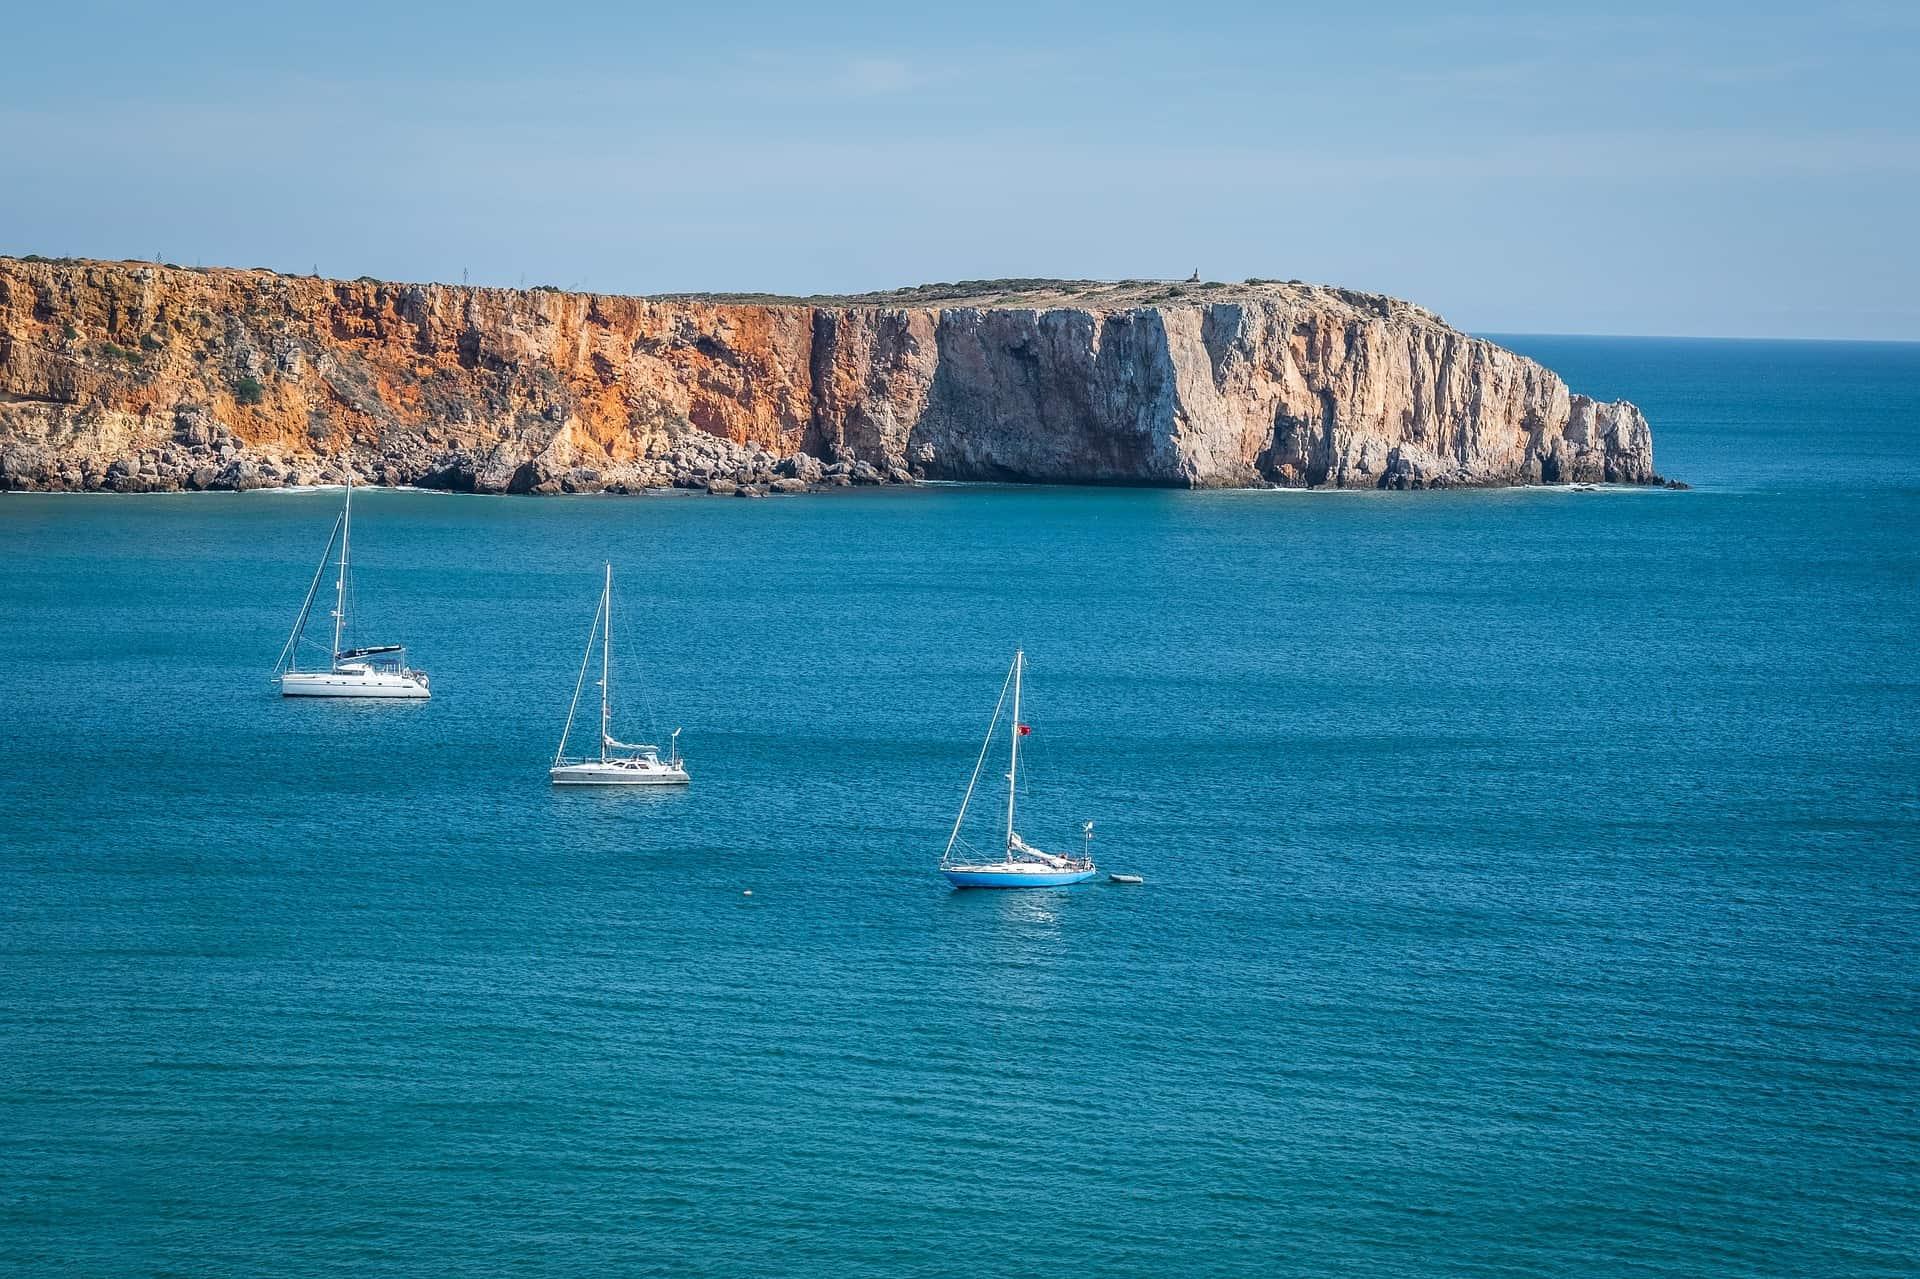 Portugal Urlaub - Ferien im 5 Sterne Hotel schon ab 304,00€